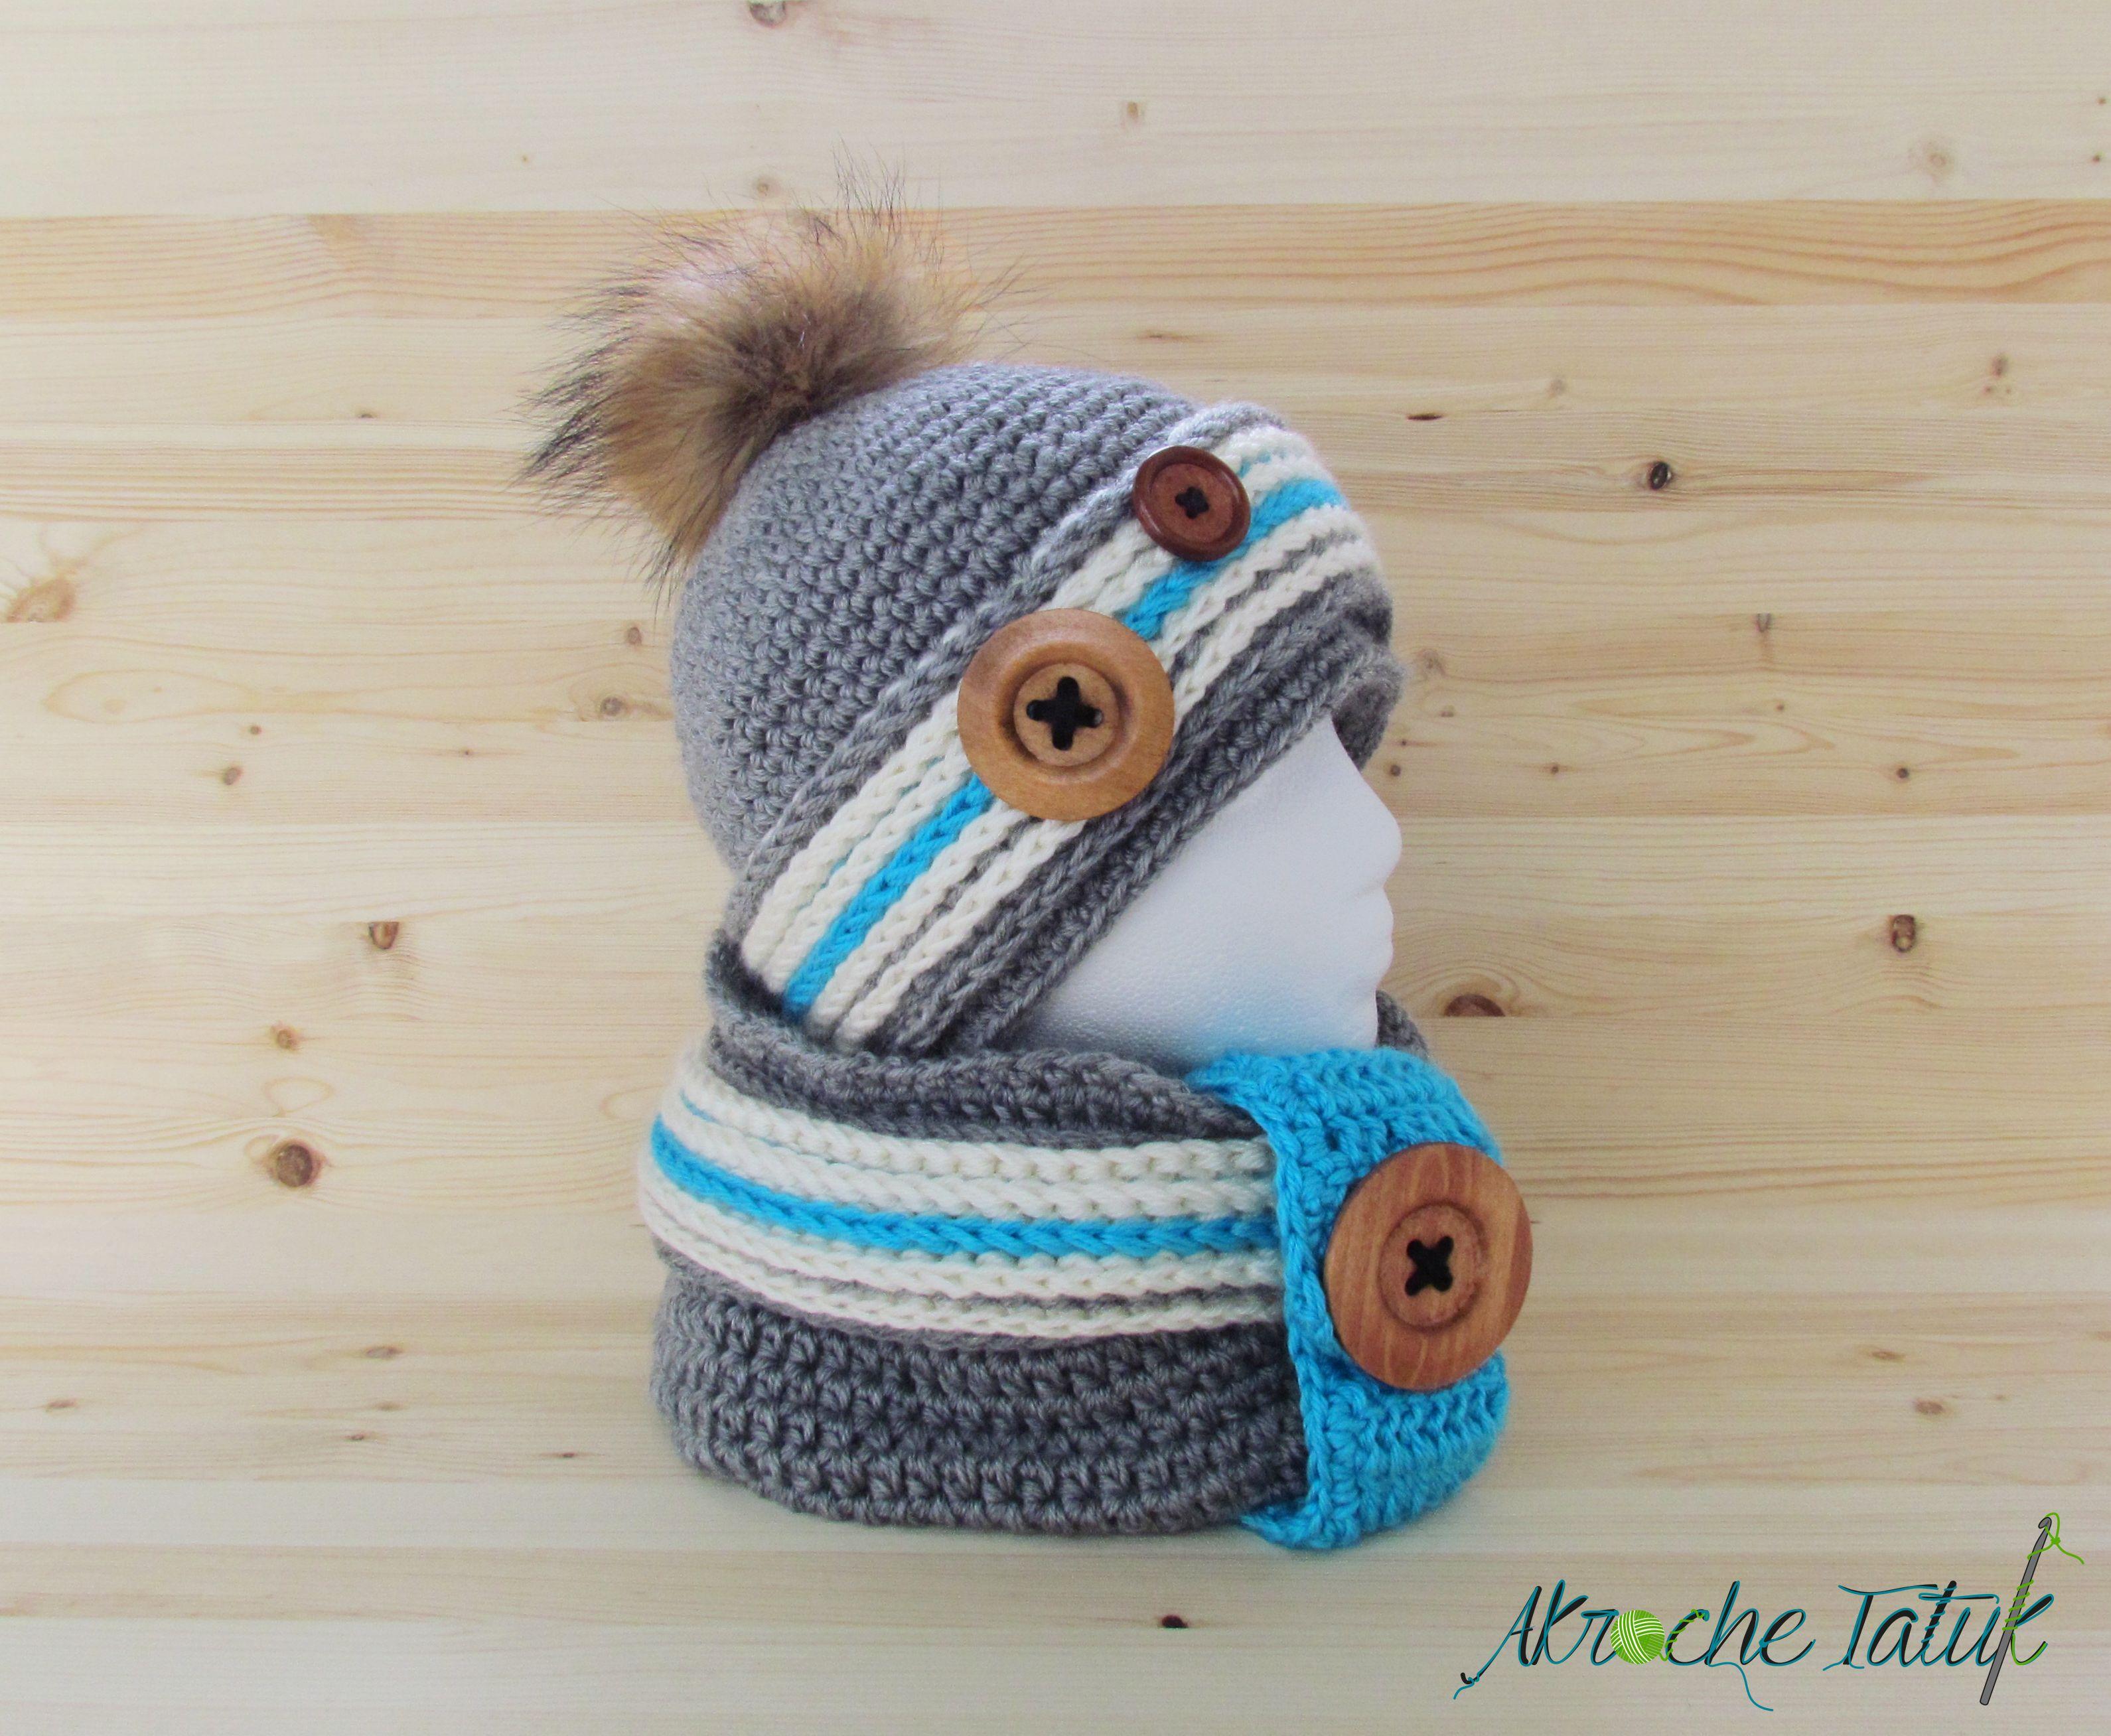 Alaska Kit. Crochet work sock hat and cowl pattern by Akroche tatuk ...